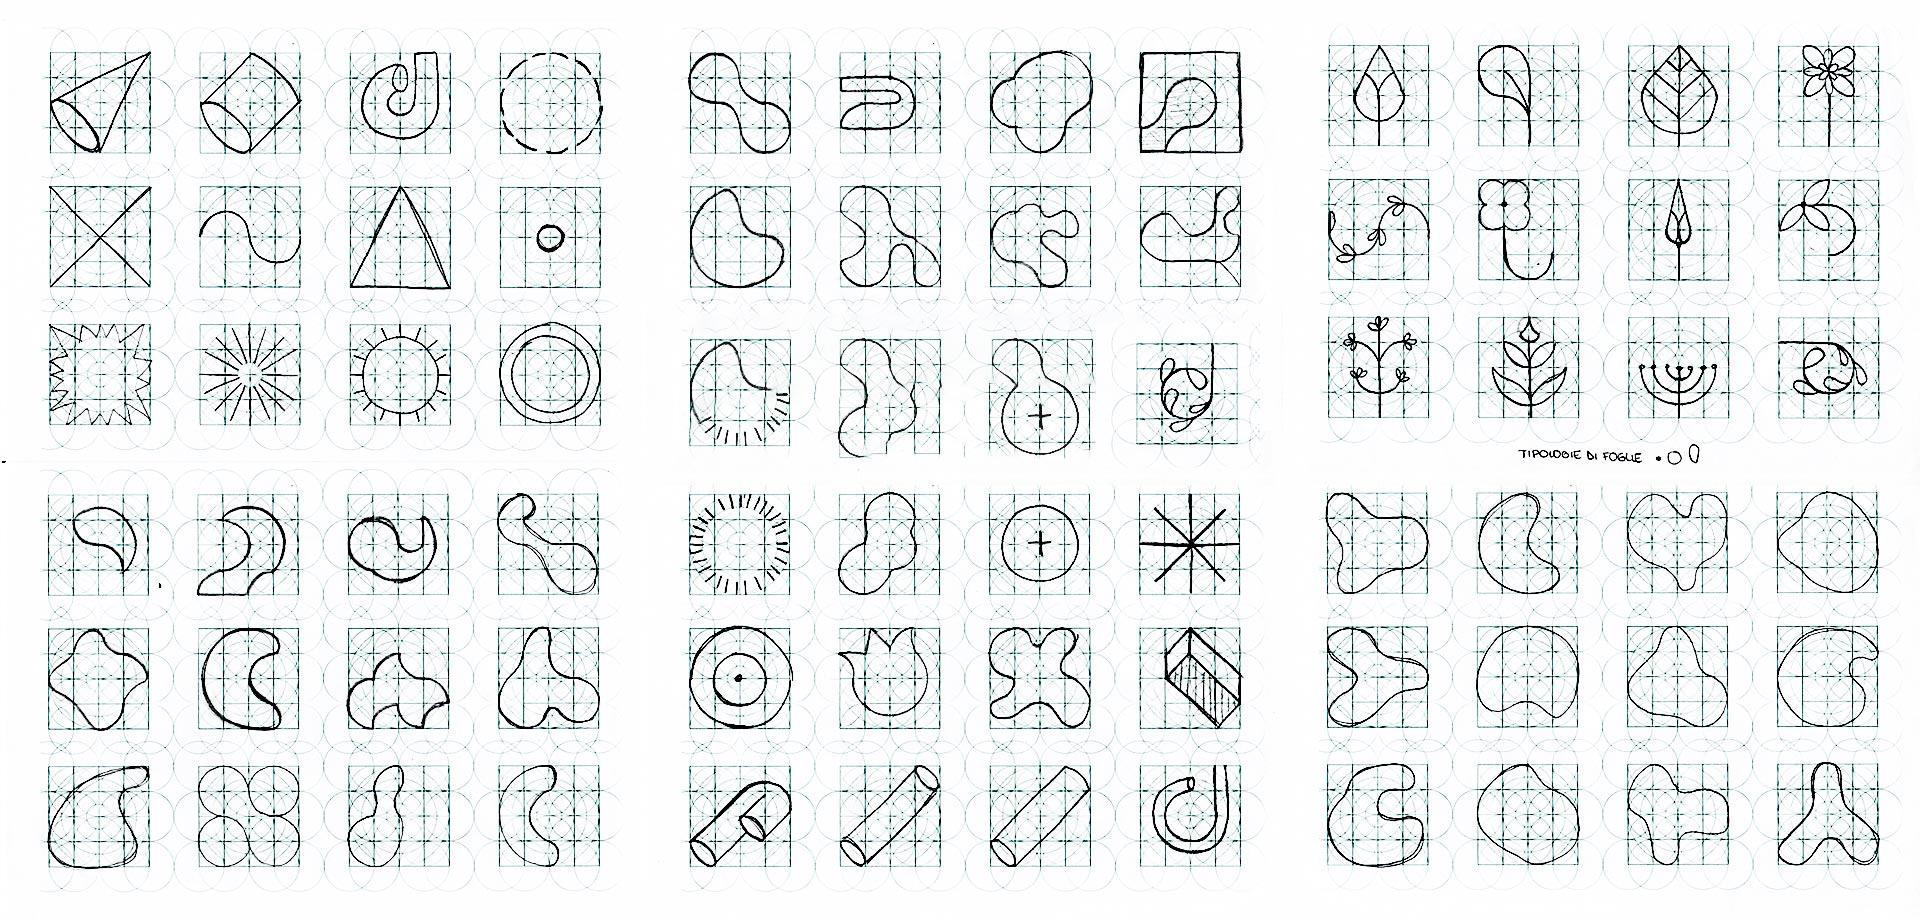 Alice_Stivala_Visual_Designer_Yucca_grid_2